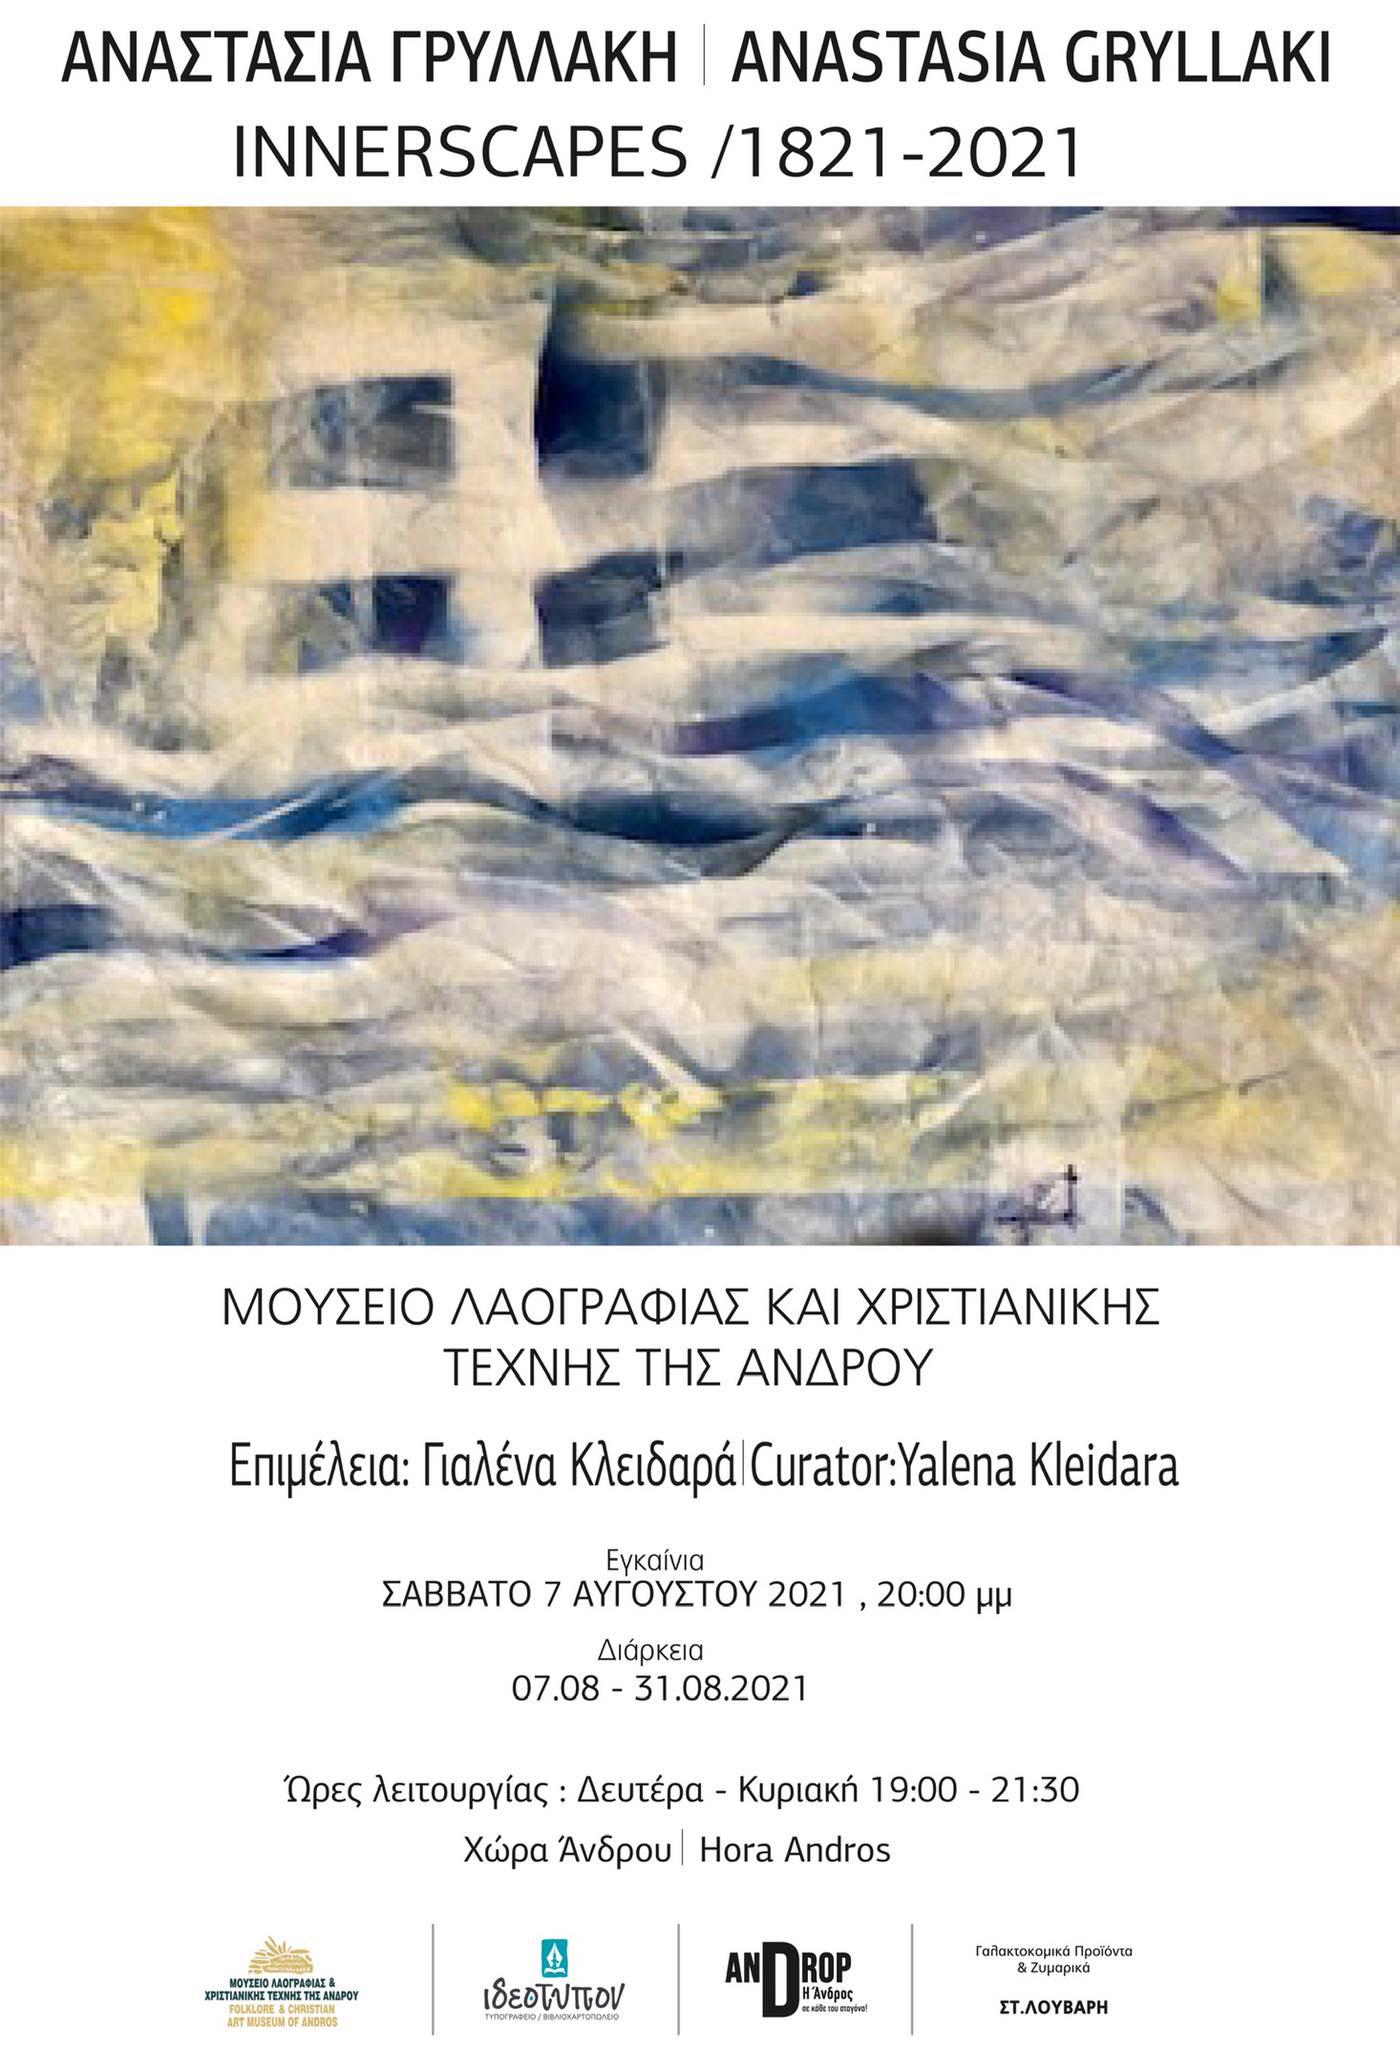 Innerscapes: Έκθεση της Αναστασίας Γρυλλάκη στο Μουσείο Λαογραφίας & Χριστιανικής Τέχνης Άνδρου